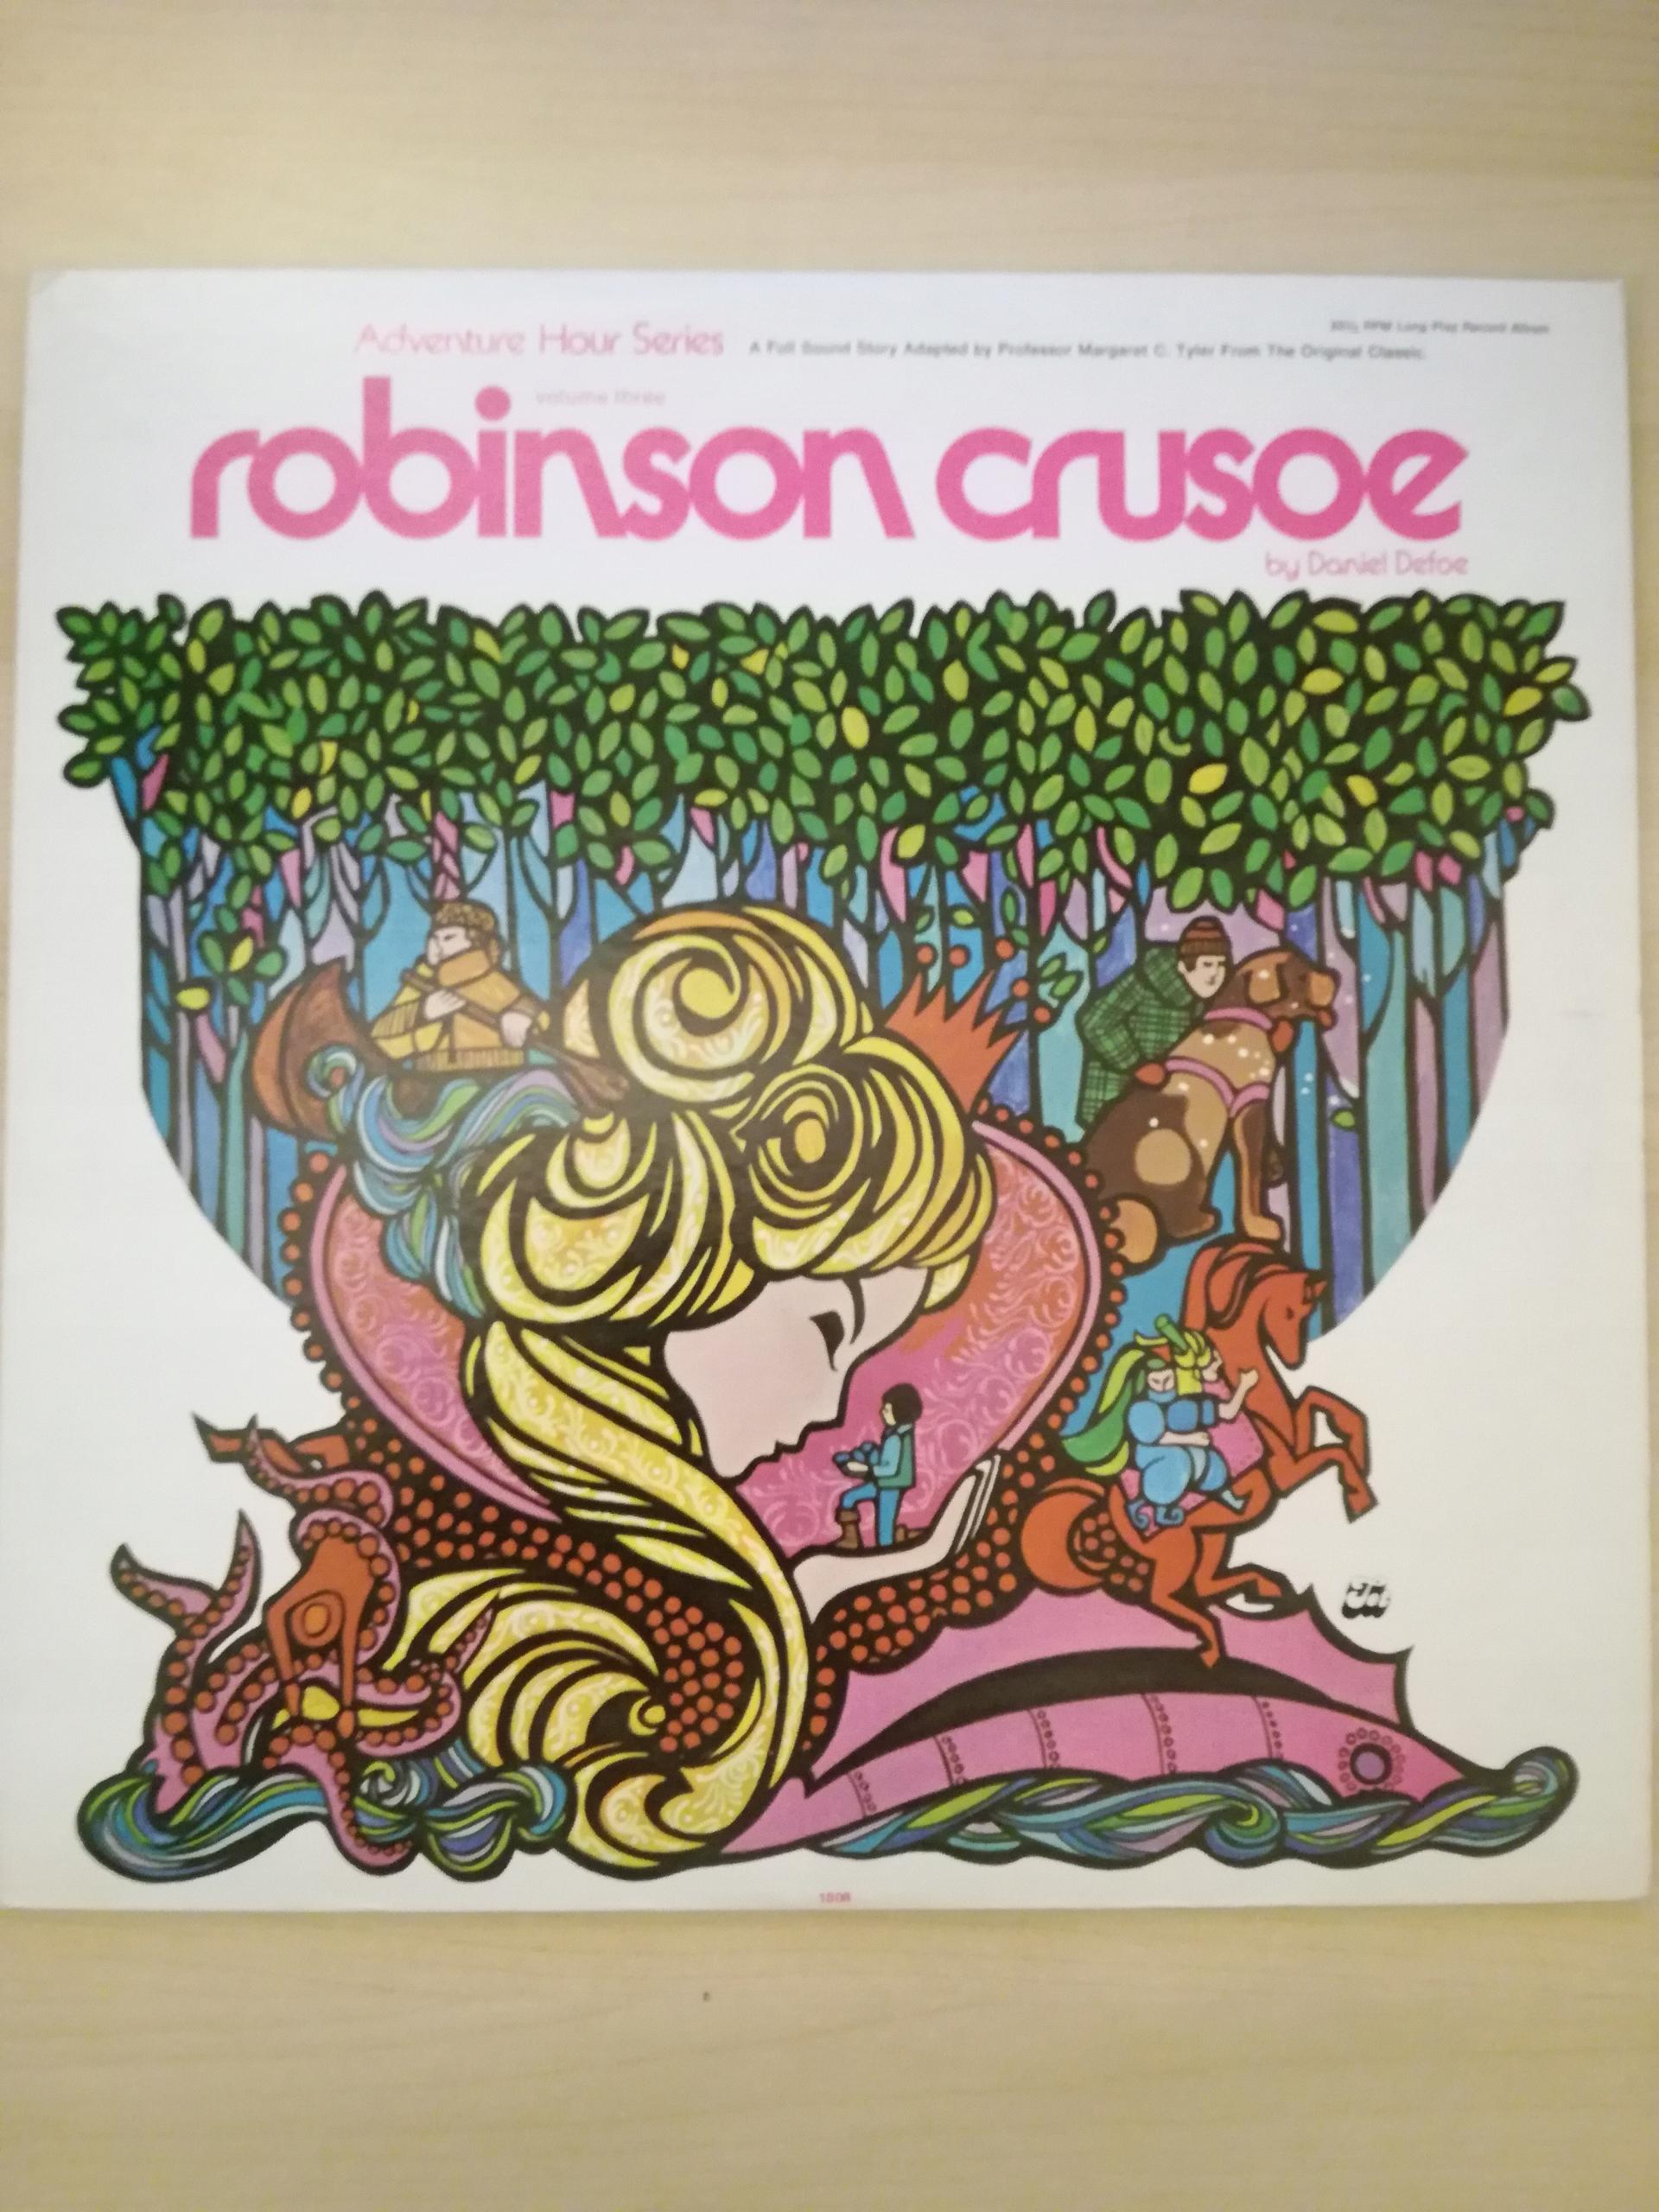 Robinson Crusoe po angielsku, LP winyl